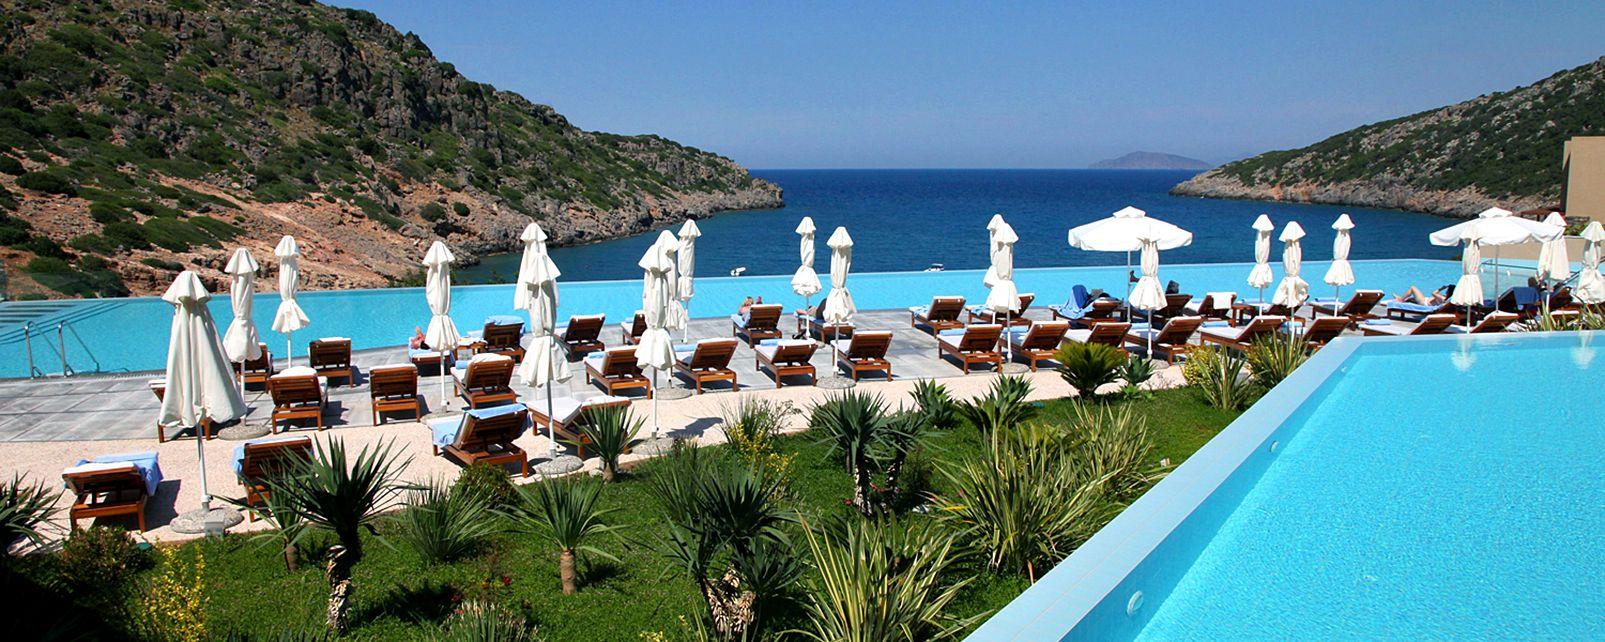 Hôtel Daios Cove